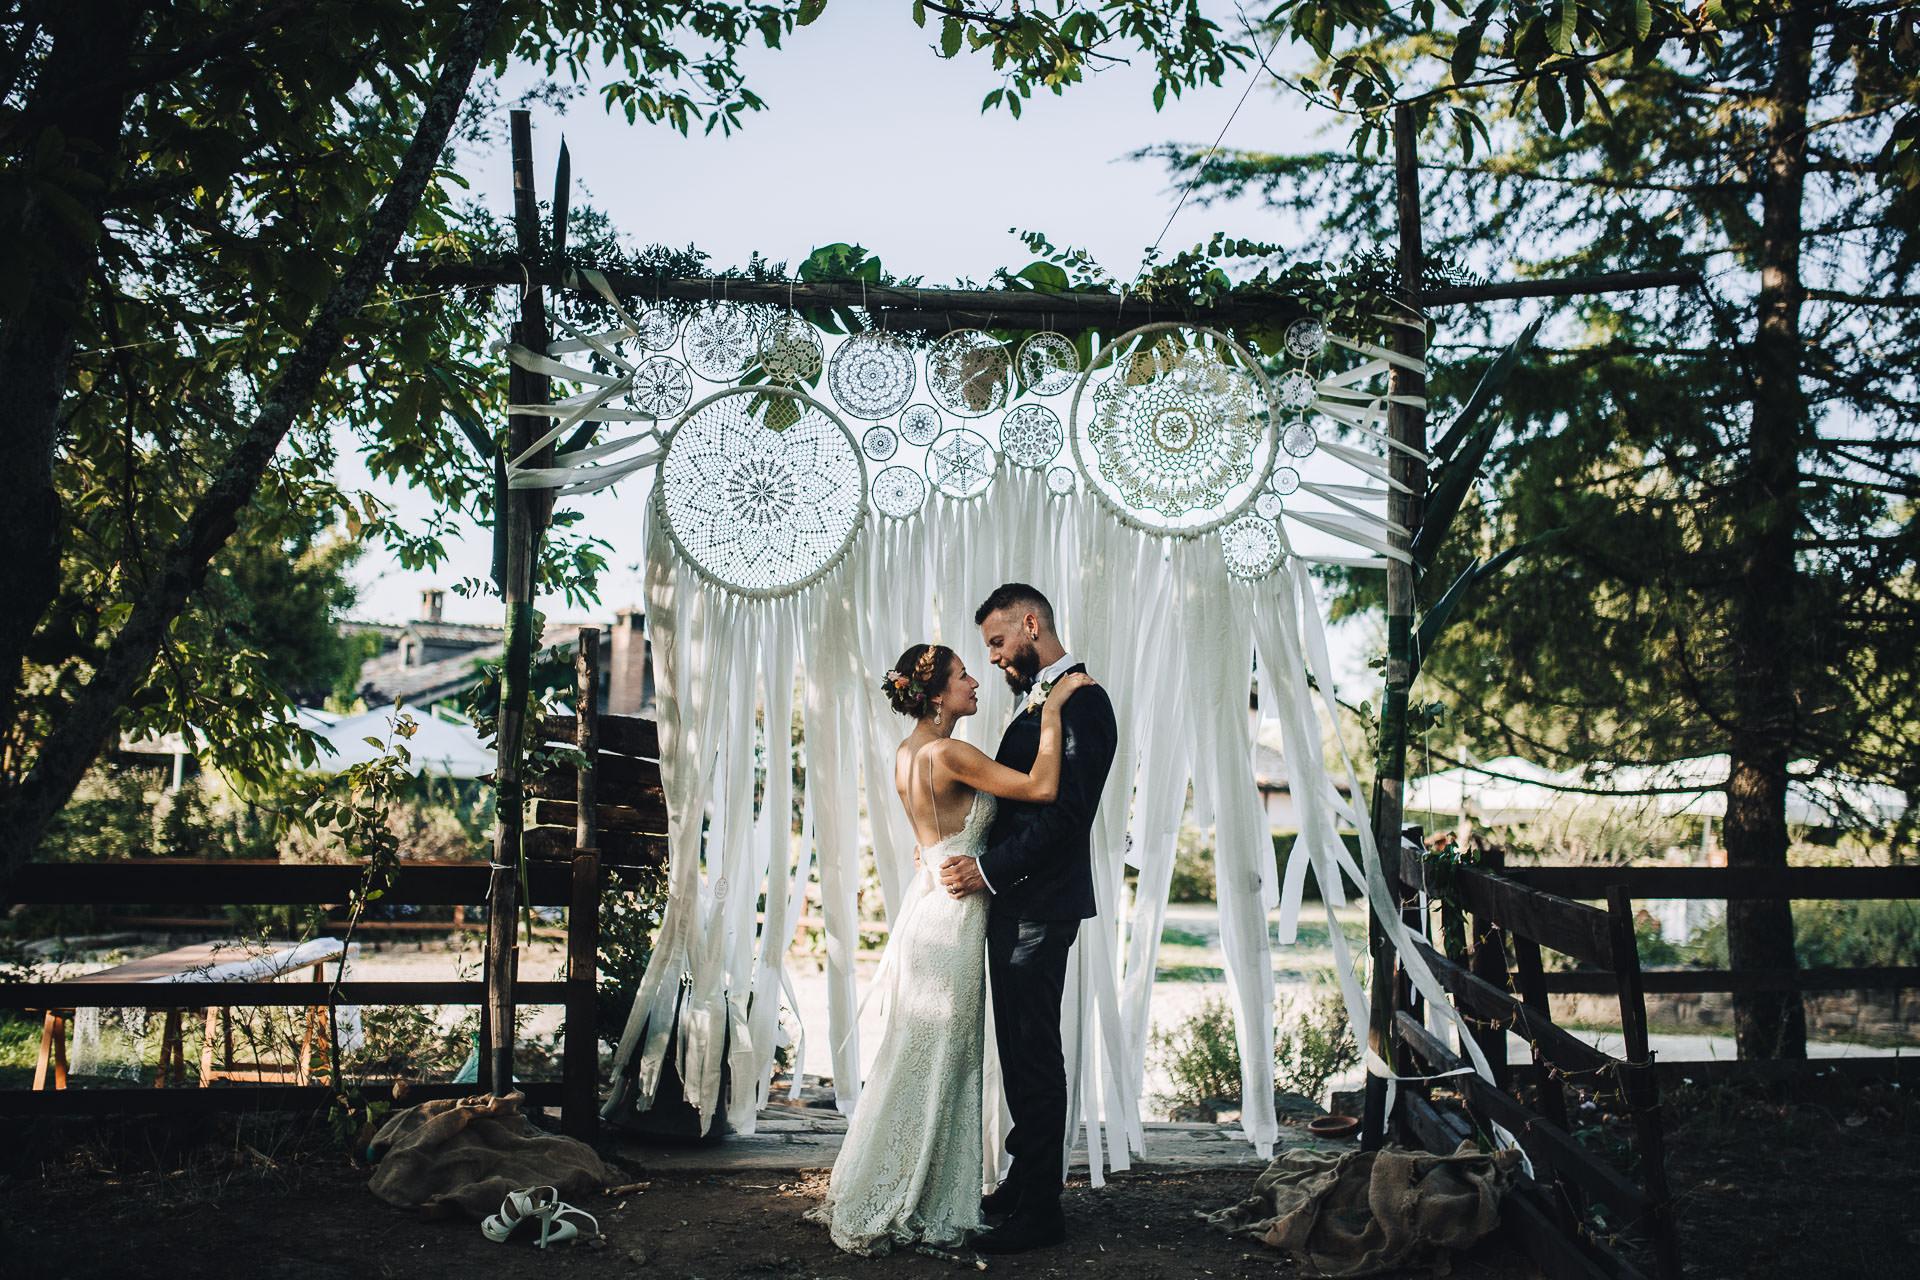 Matrimonio Nel Bosco Toscana : Matrimonio boho nel bosco u whitelife studio